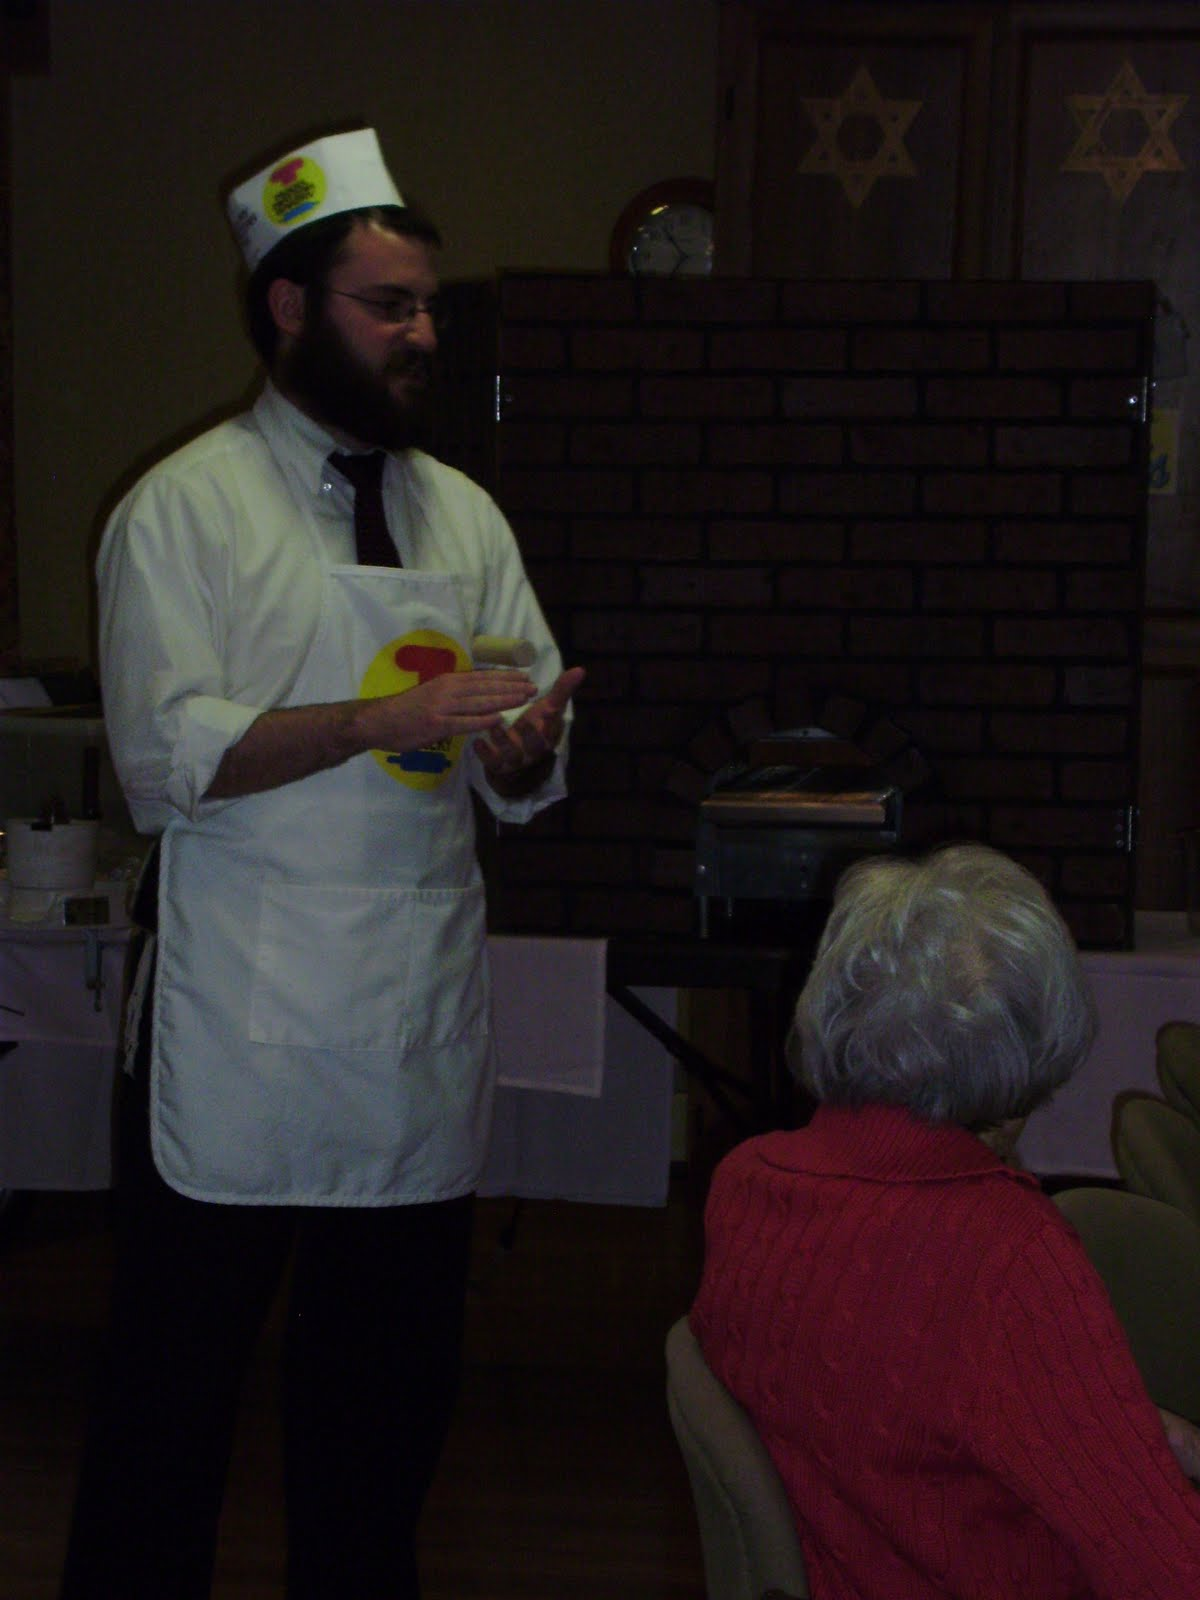 Rabbi Friedman In Kew Gardens Hills: The Wiggins Place Blog: The Model Matzah Bakery With The